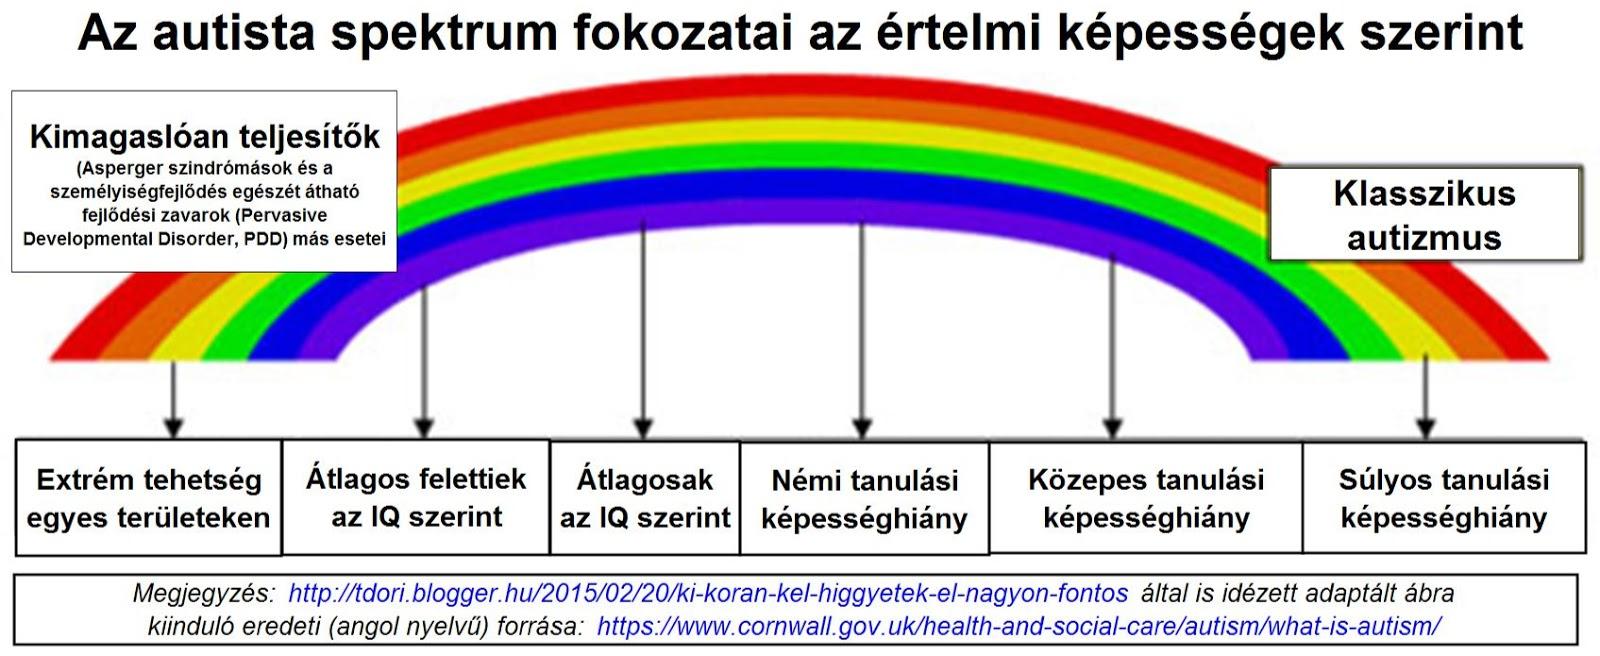 1_0_autizmus_szivarvany_kepe.JPG